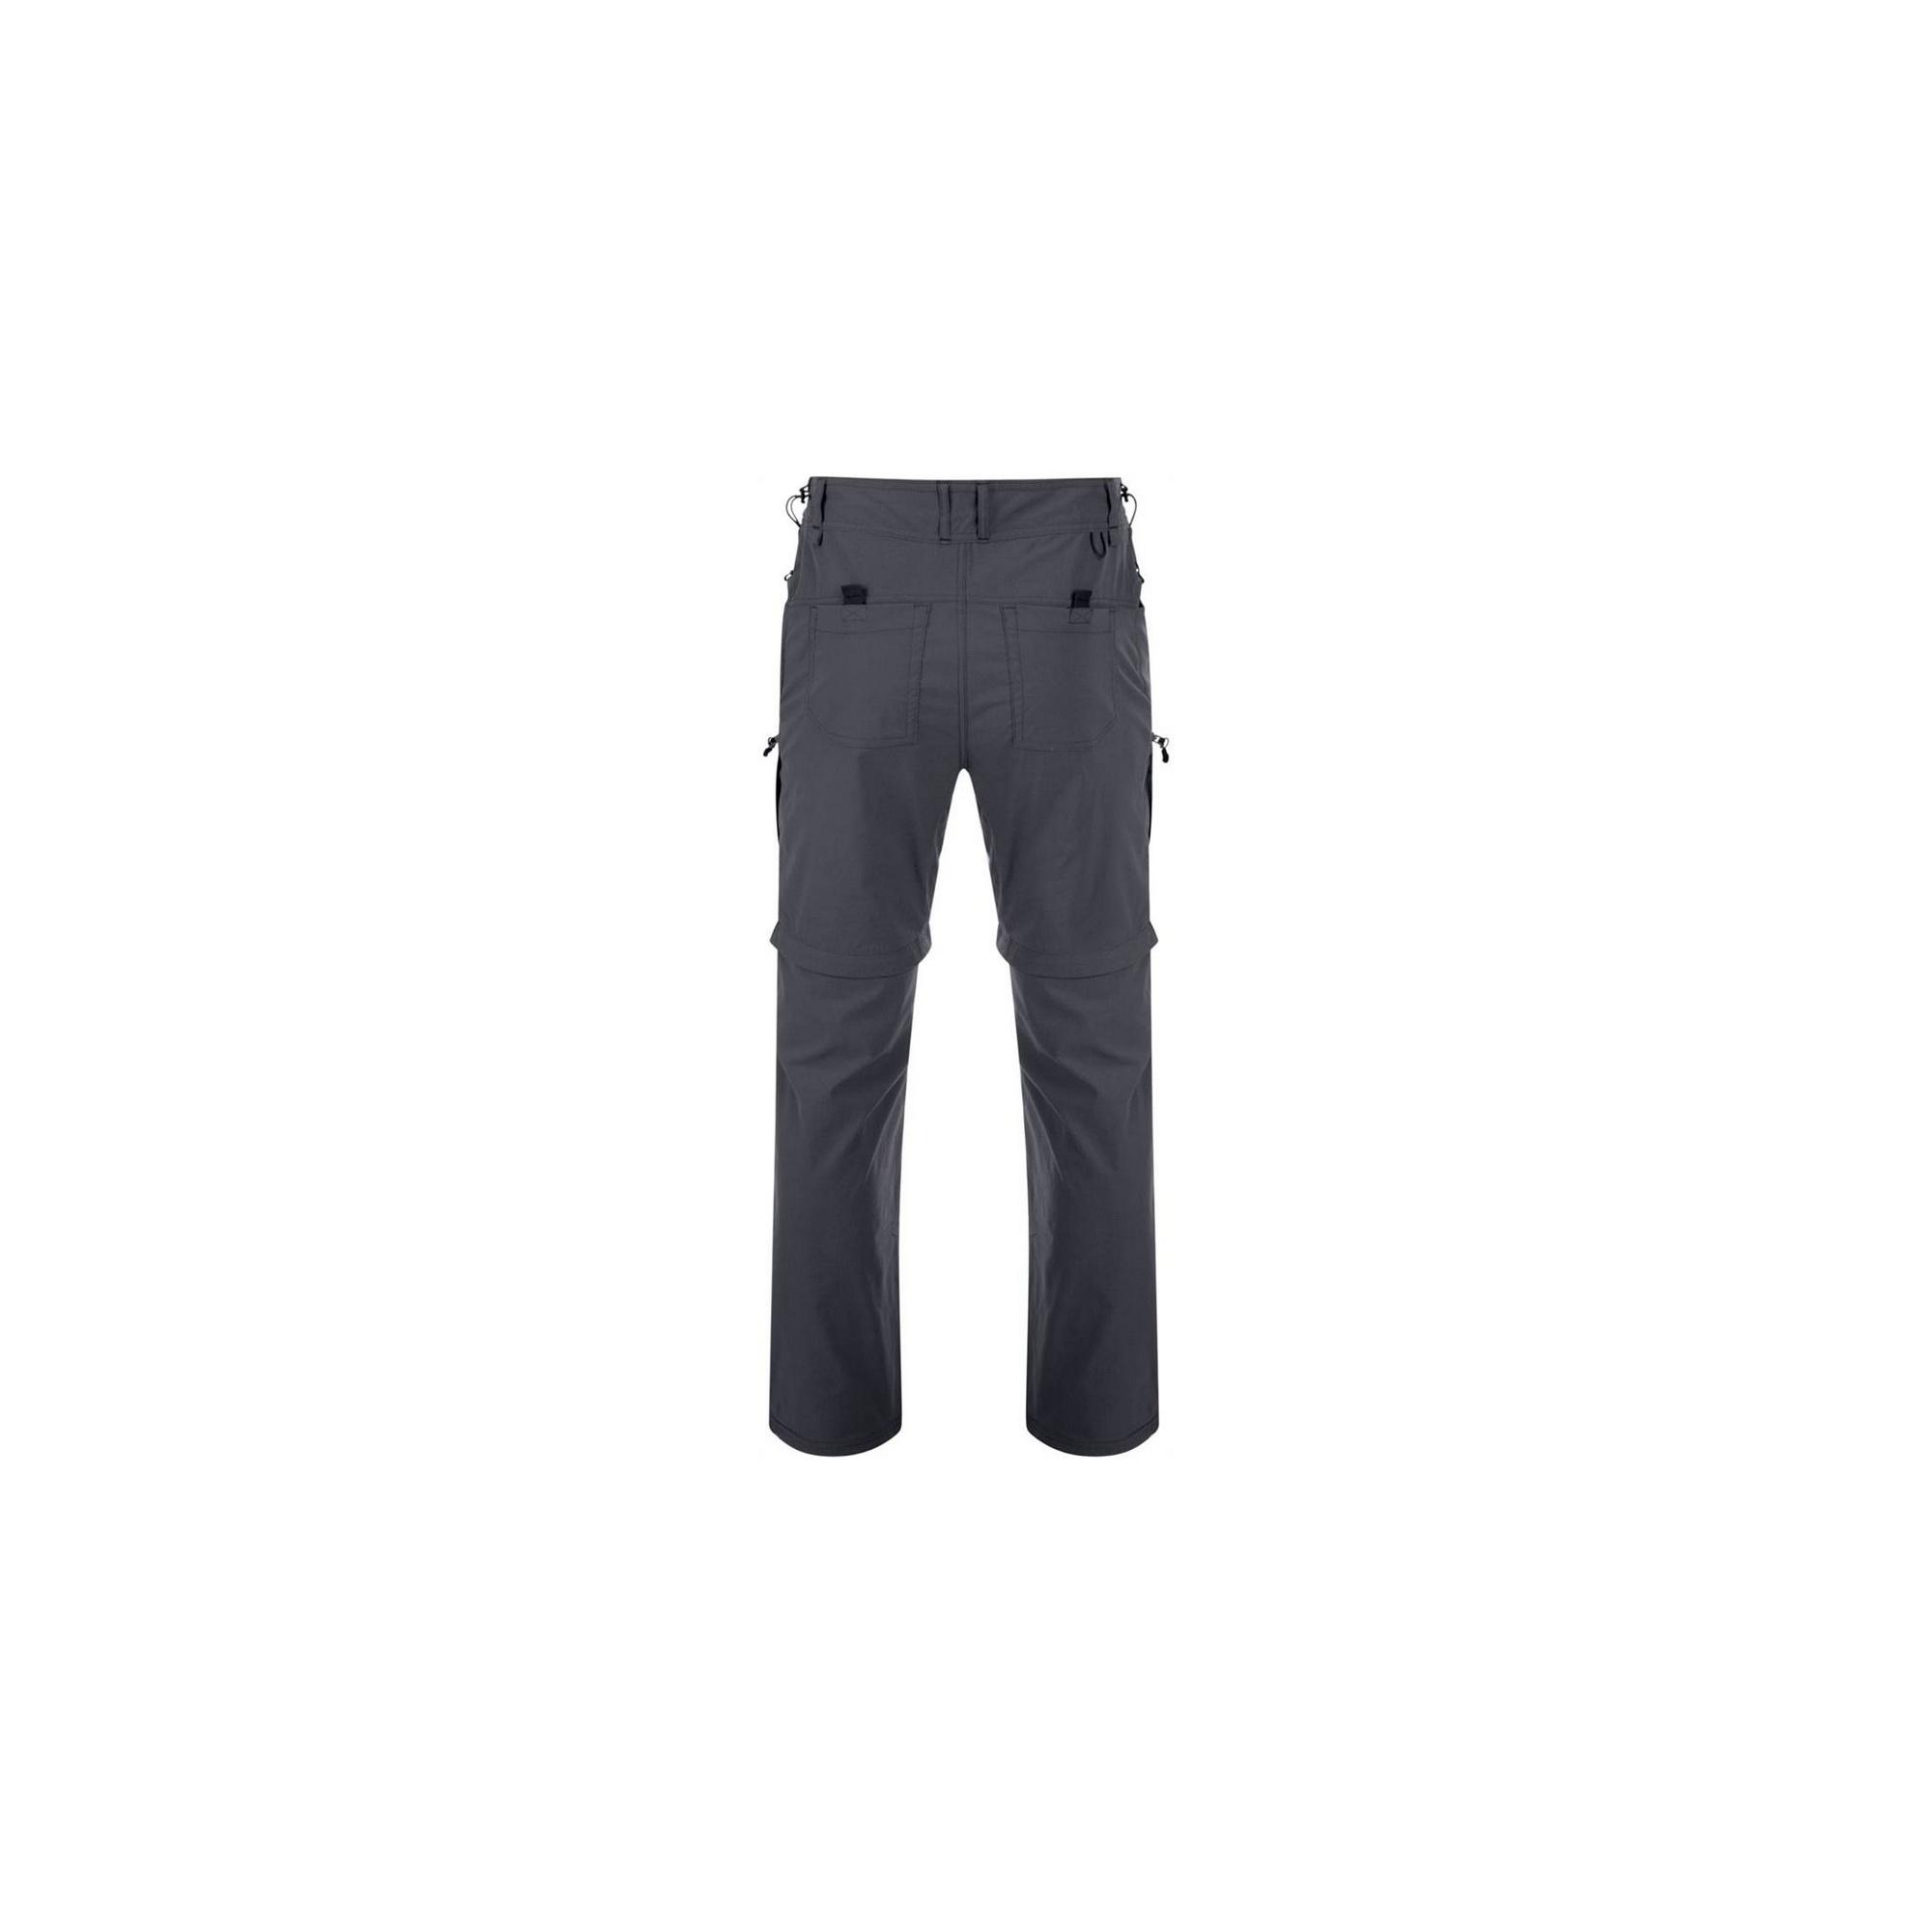 Dare2B Mens Tuned In Zip Off Trousers (42R) (Black)